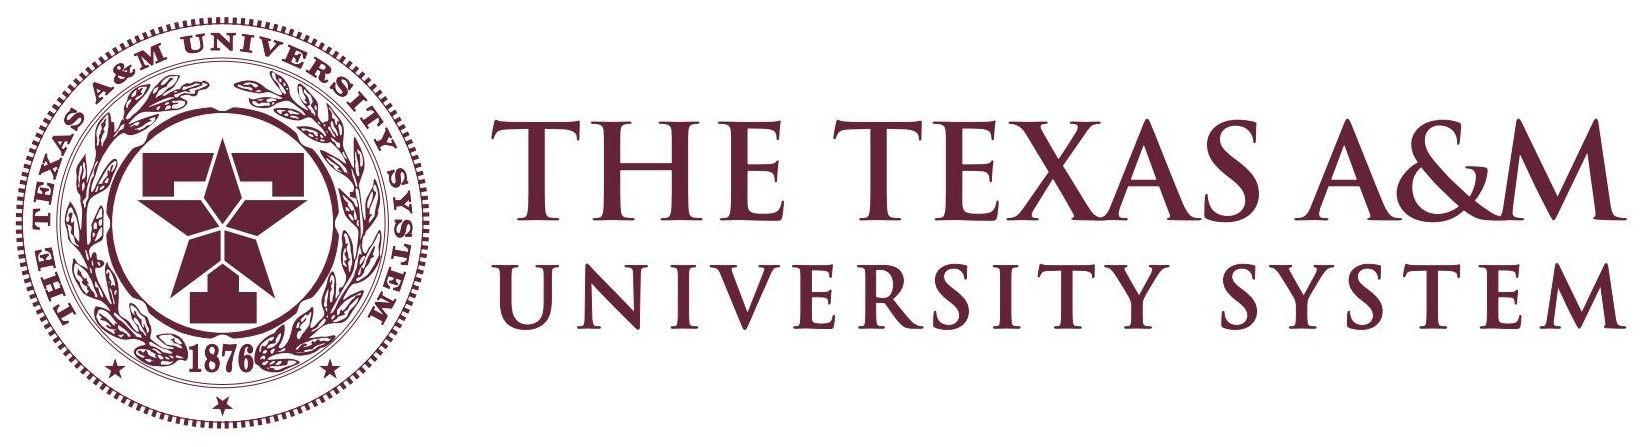 Pin By Karen Lucas On Texas A M University Texas A M Texas A M University Texas